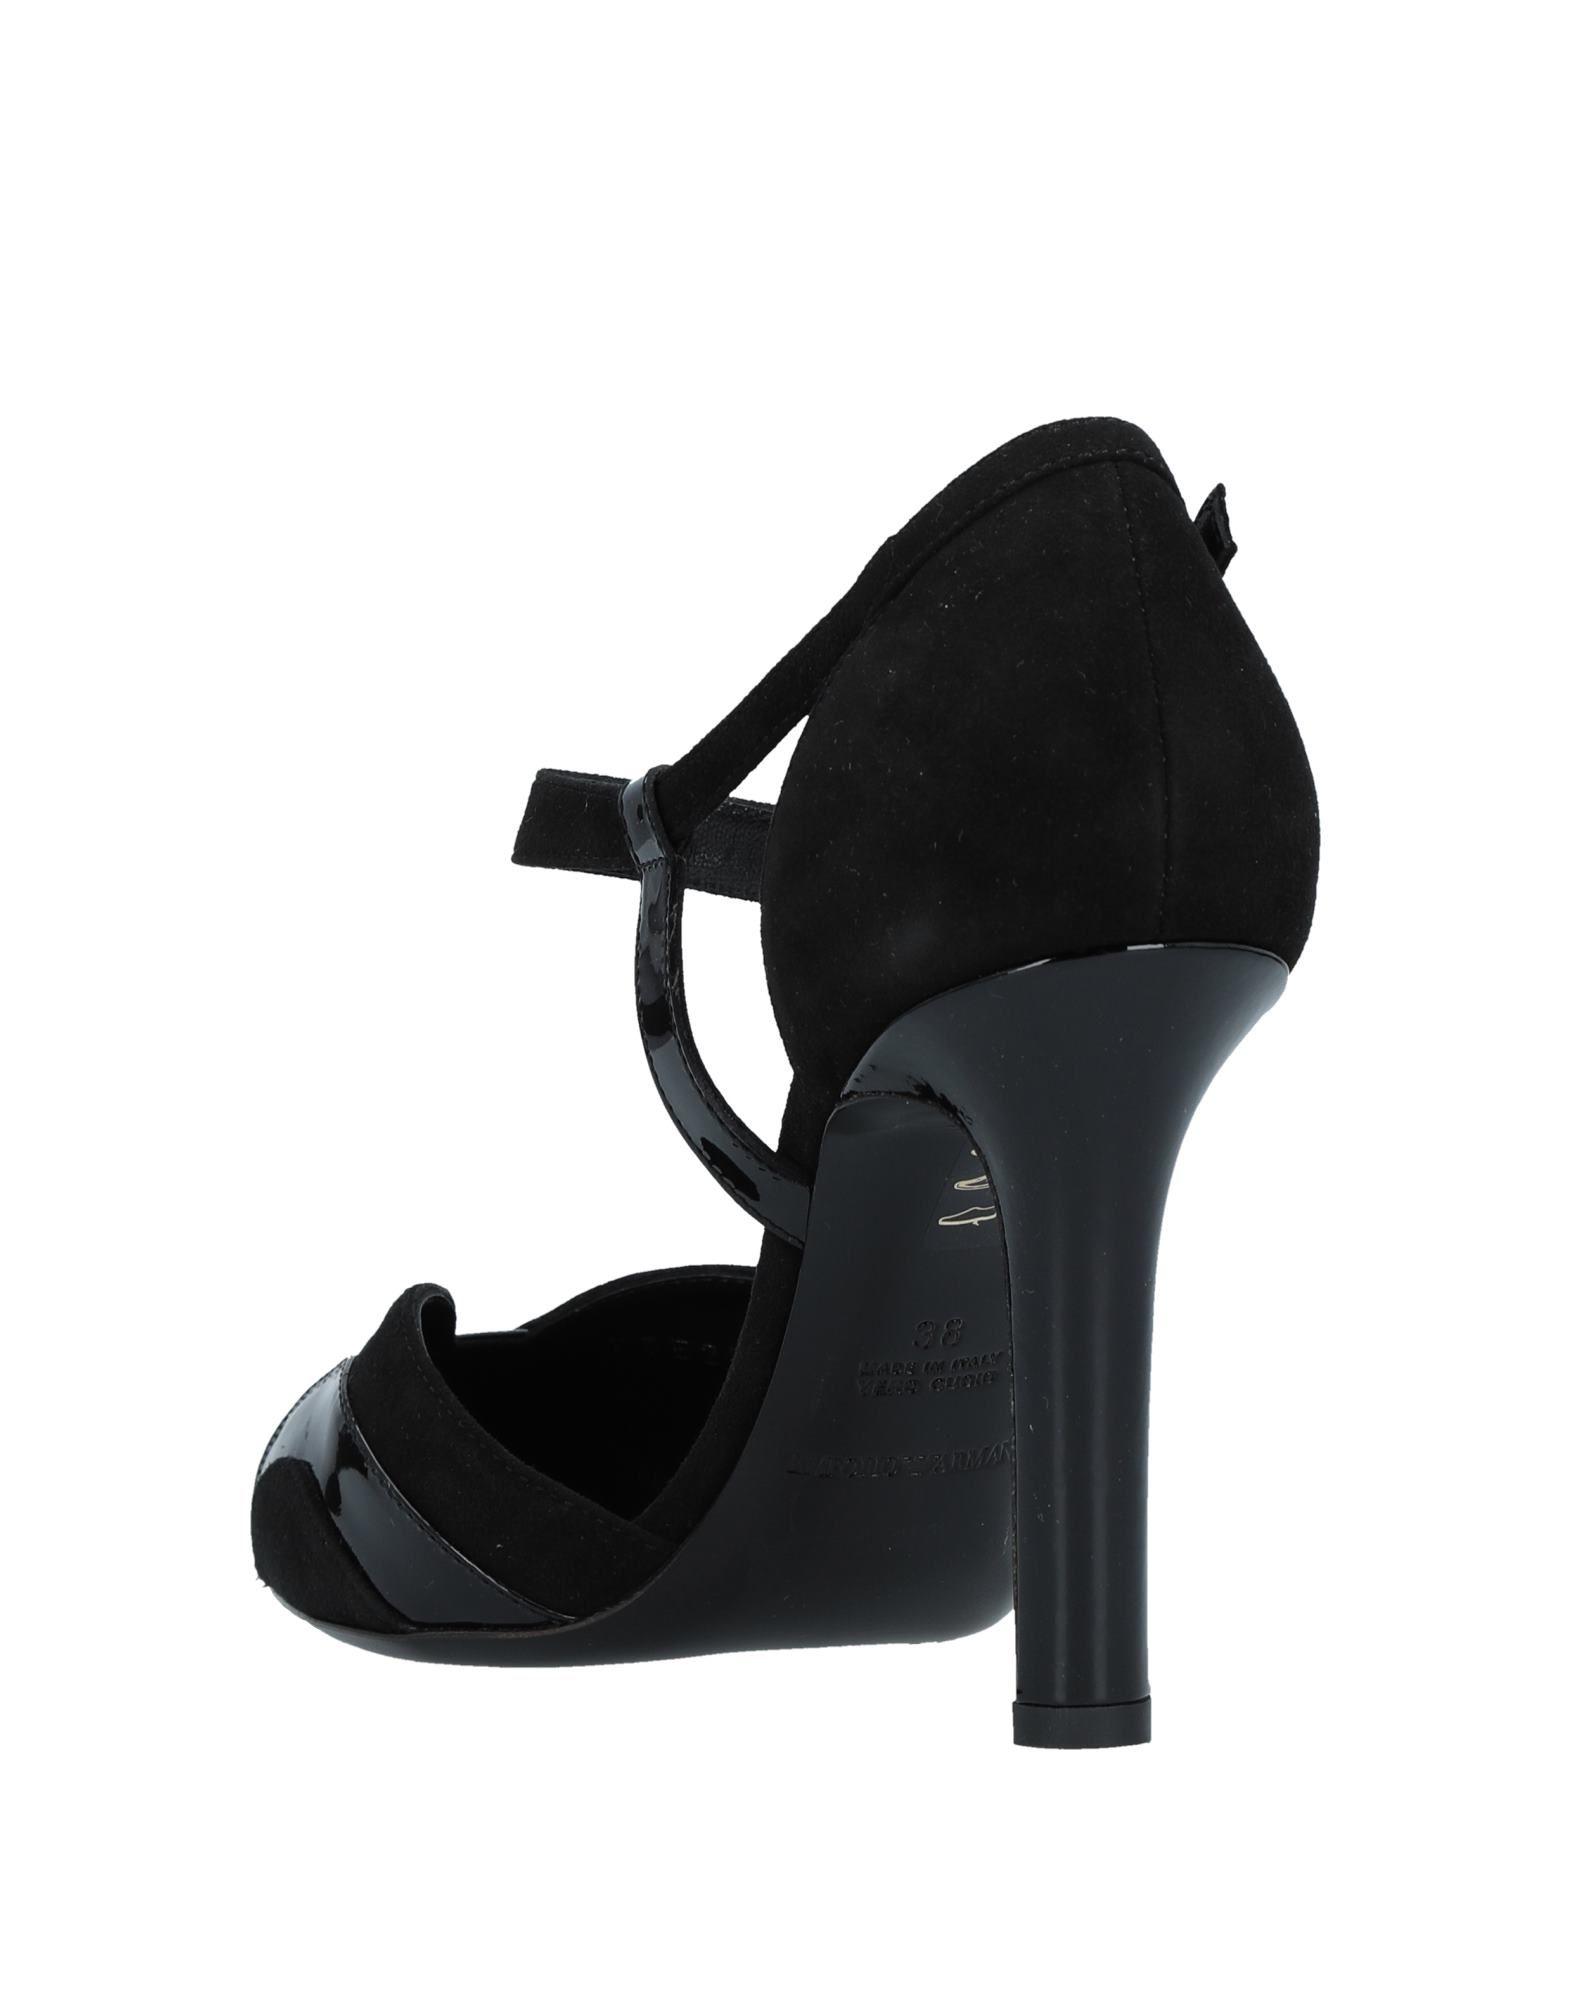 Rabatt Damen Schuhe Emporio Armani Pumps Damen Rabatt  11523566SQ ab9dbf